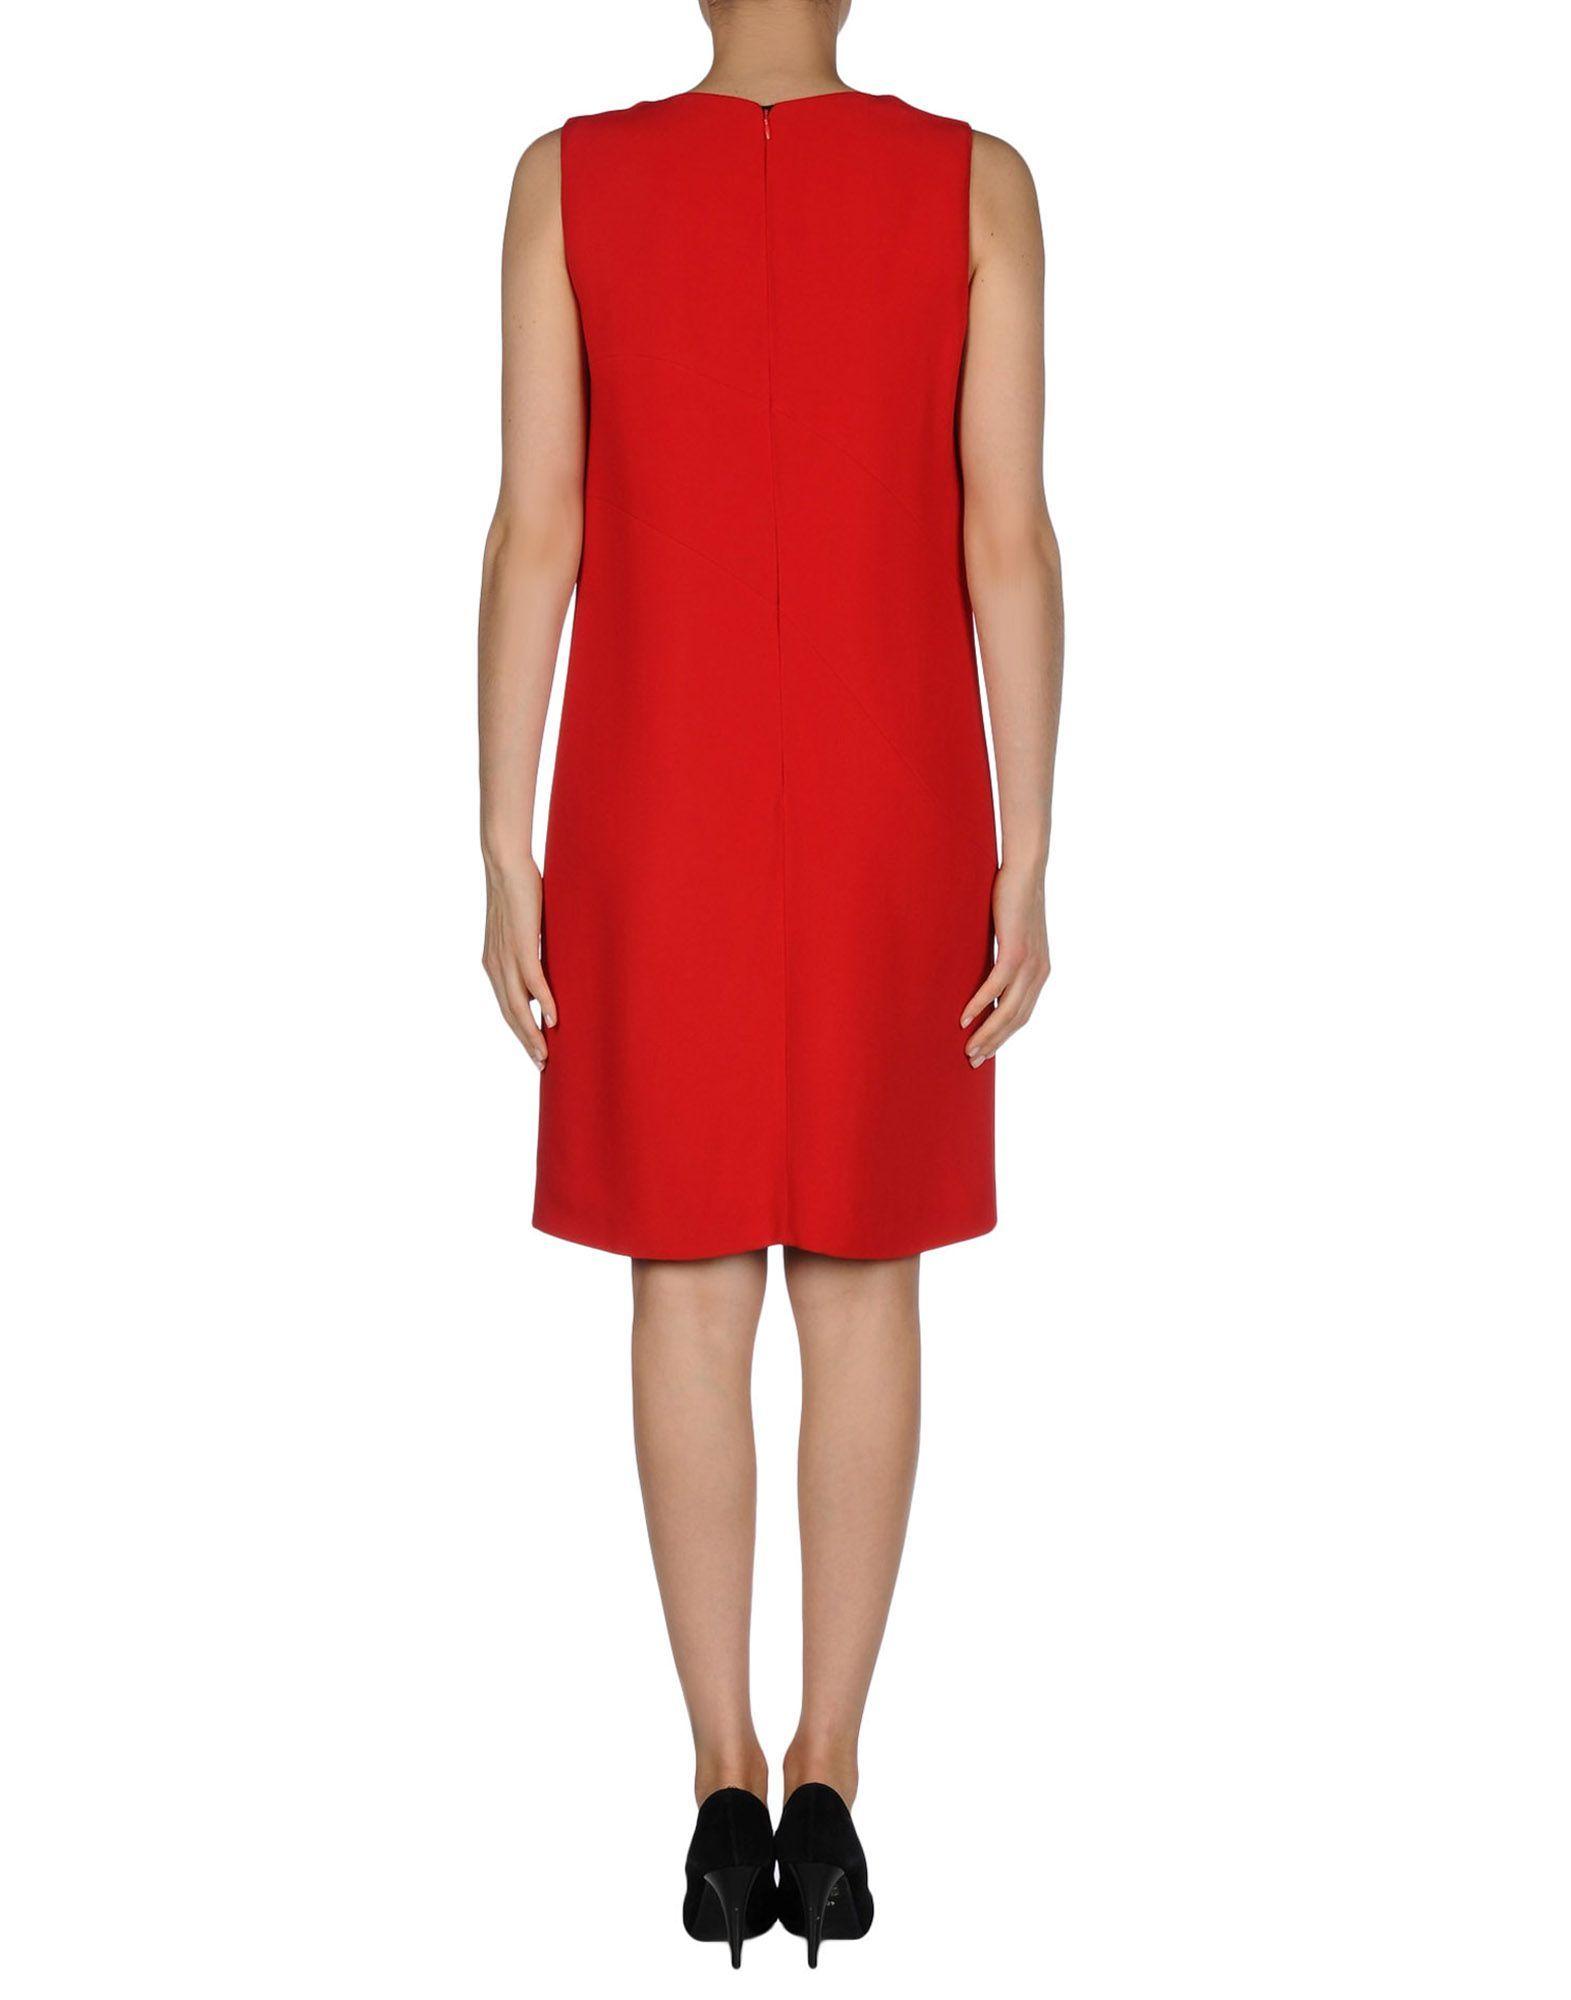 Prada women short dress on yooxcom the best online selection of